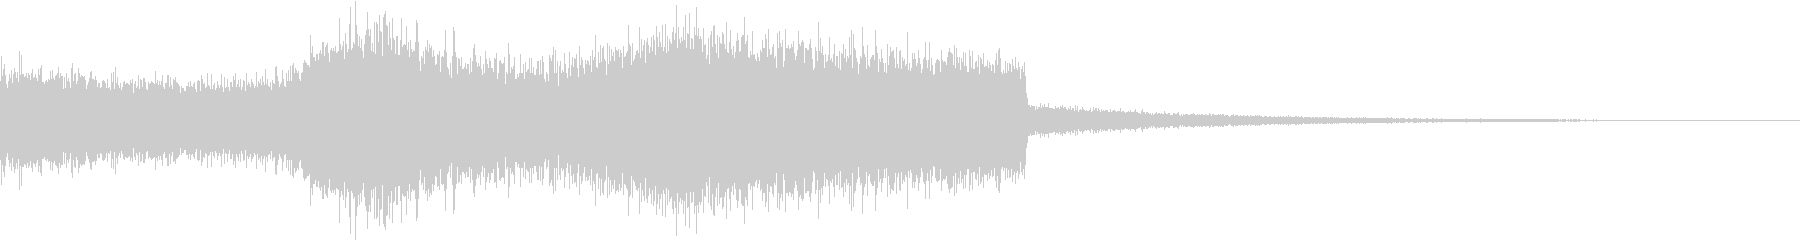 RadioSFX ラジオなど曲前のSEの未再生の波形